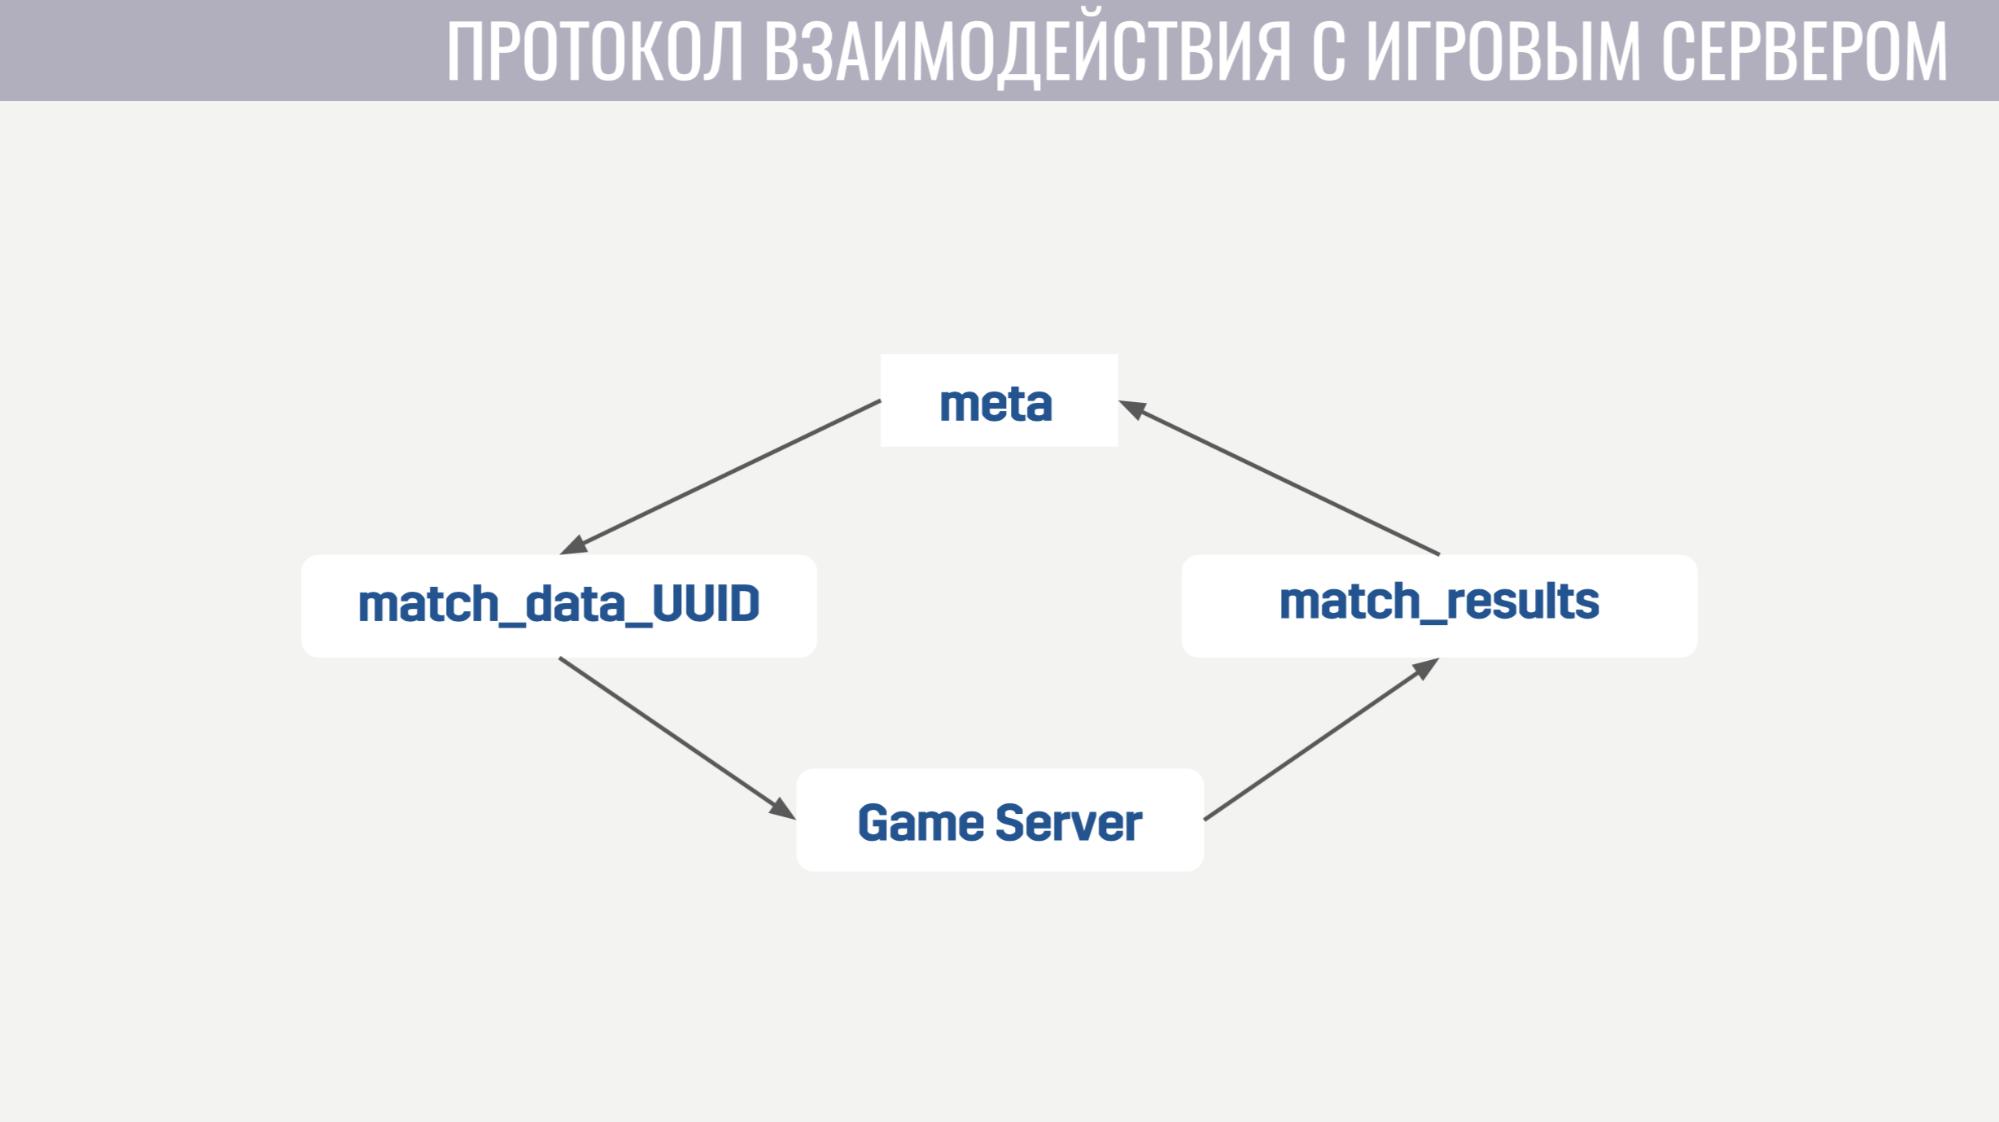 Архитектура мета-сервера мобильного онлайн-шутера Tacticool - 11